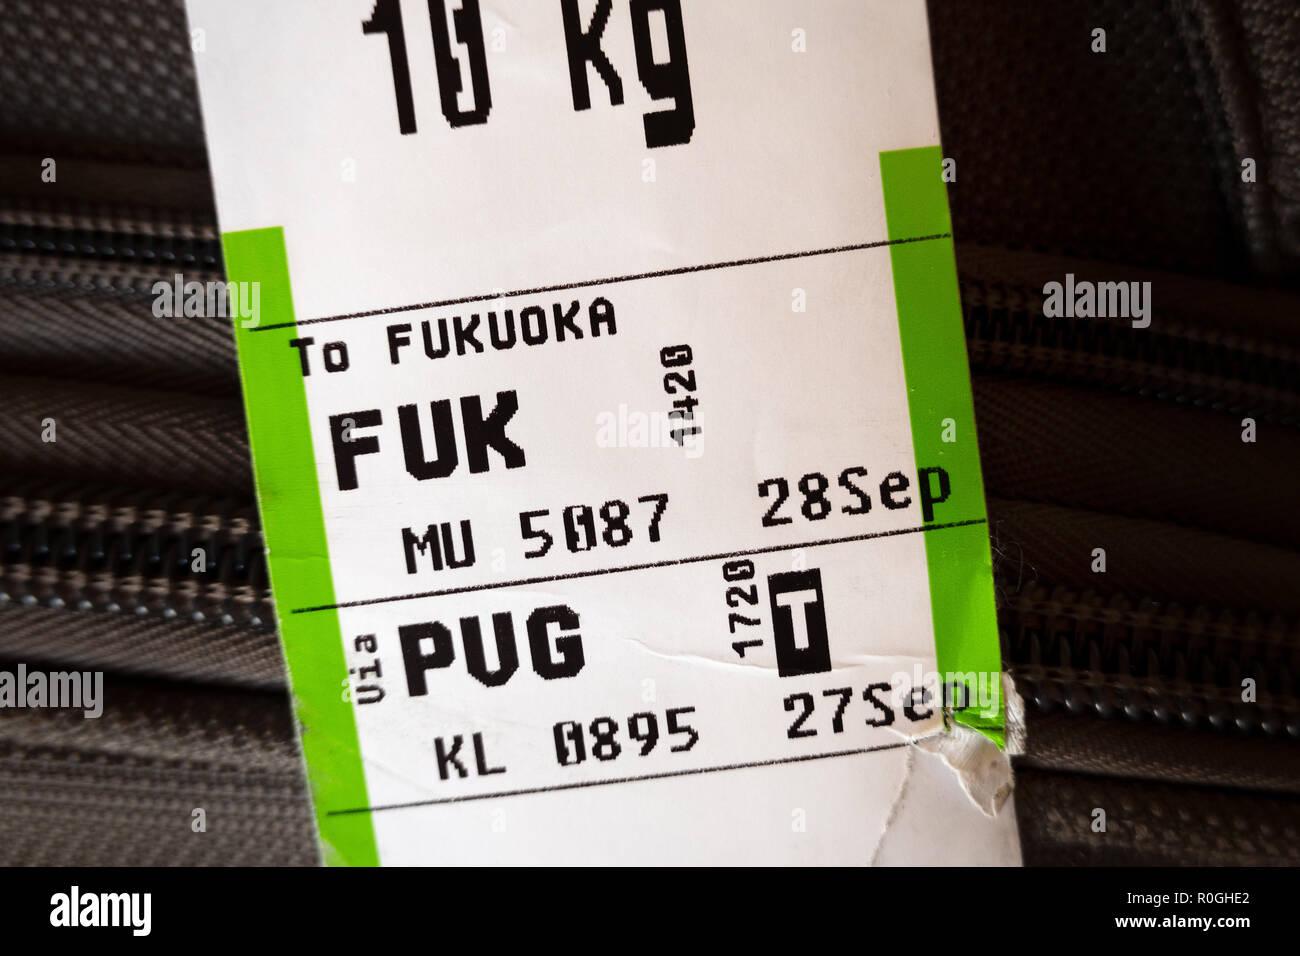 Reisegepäck Fluggesellschaft Kofferanhänger zeigen Es aus Schanghai PVG Fukuoka FUK Flughäfen. Stockbild